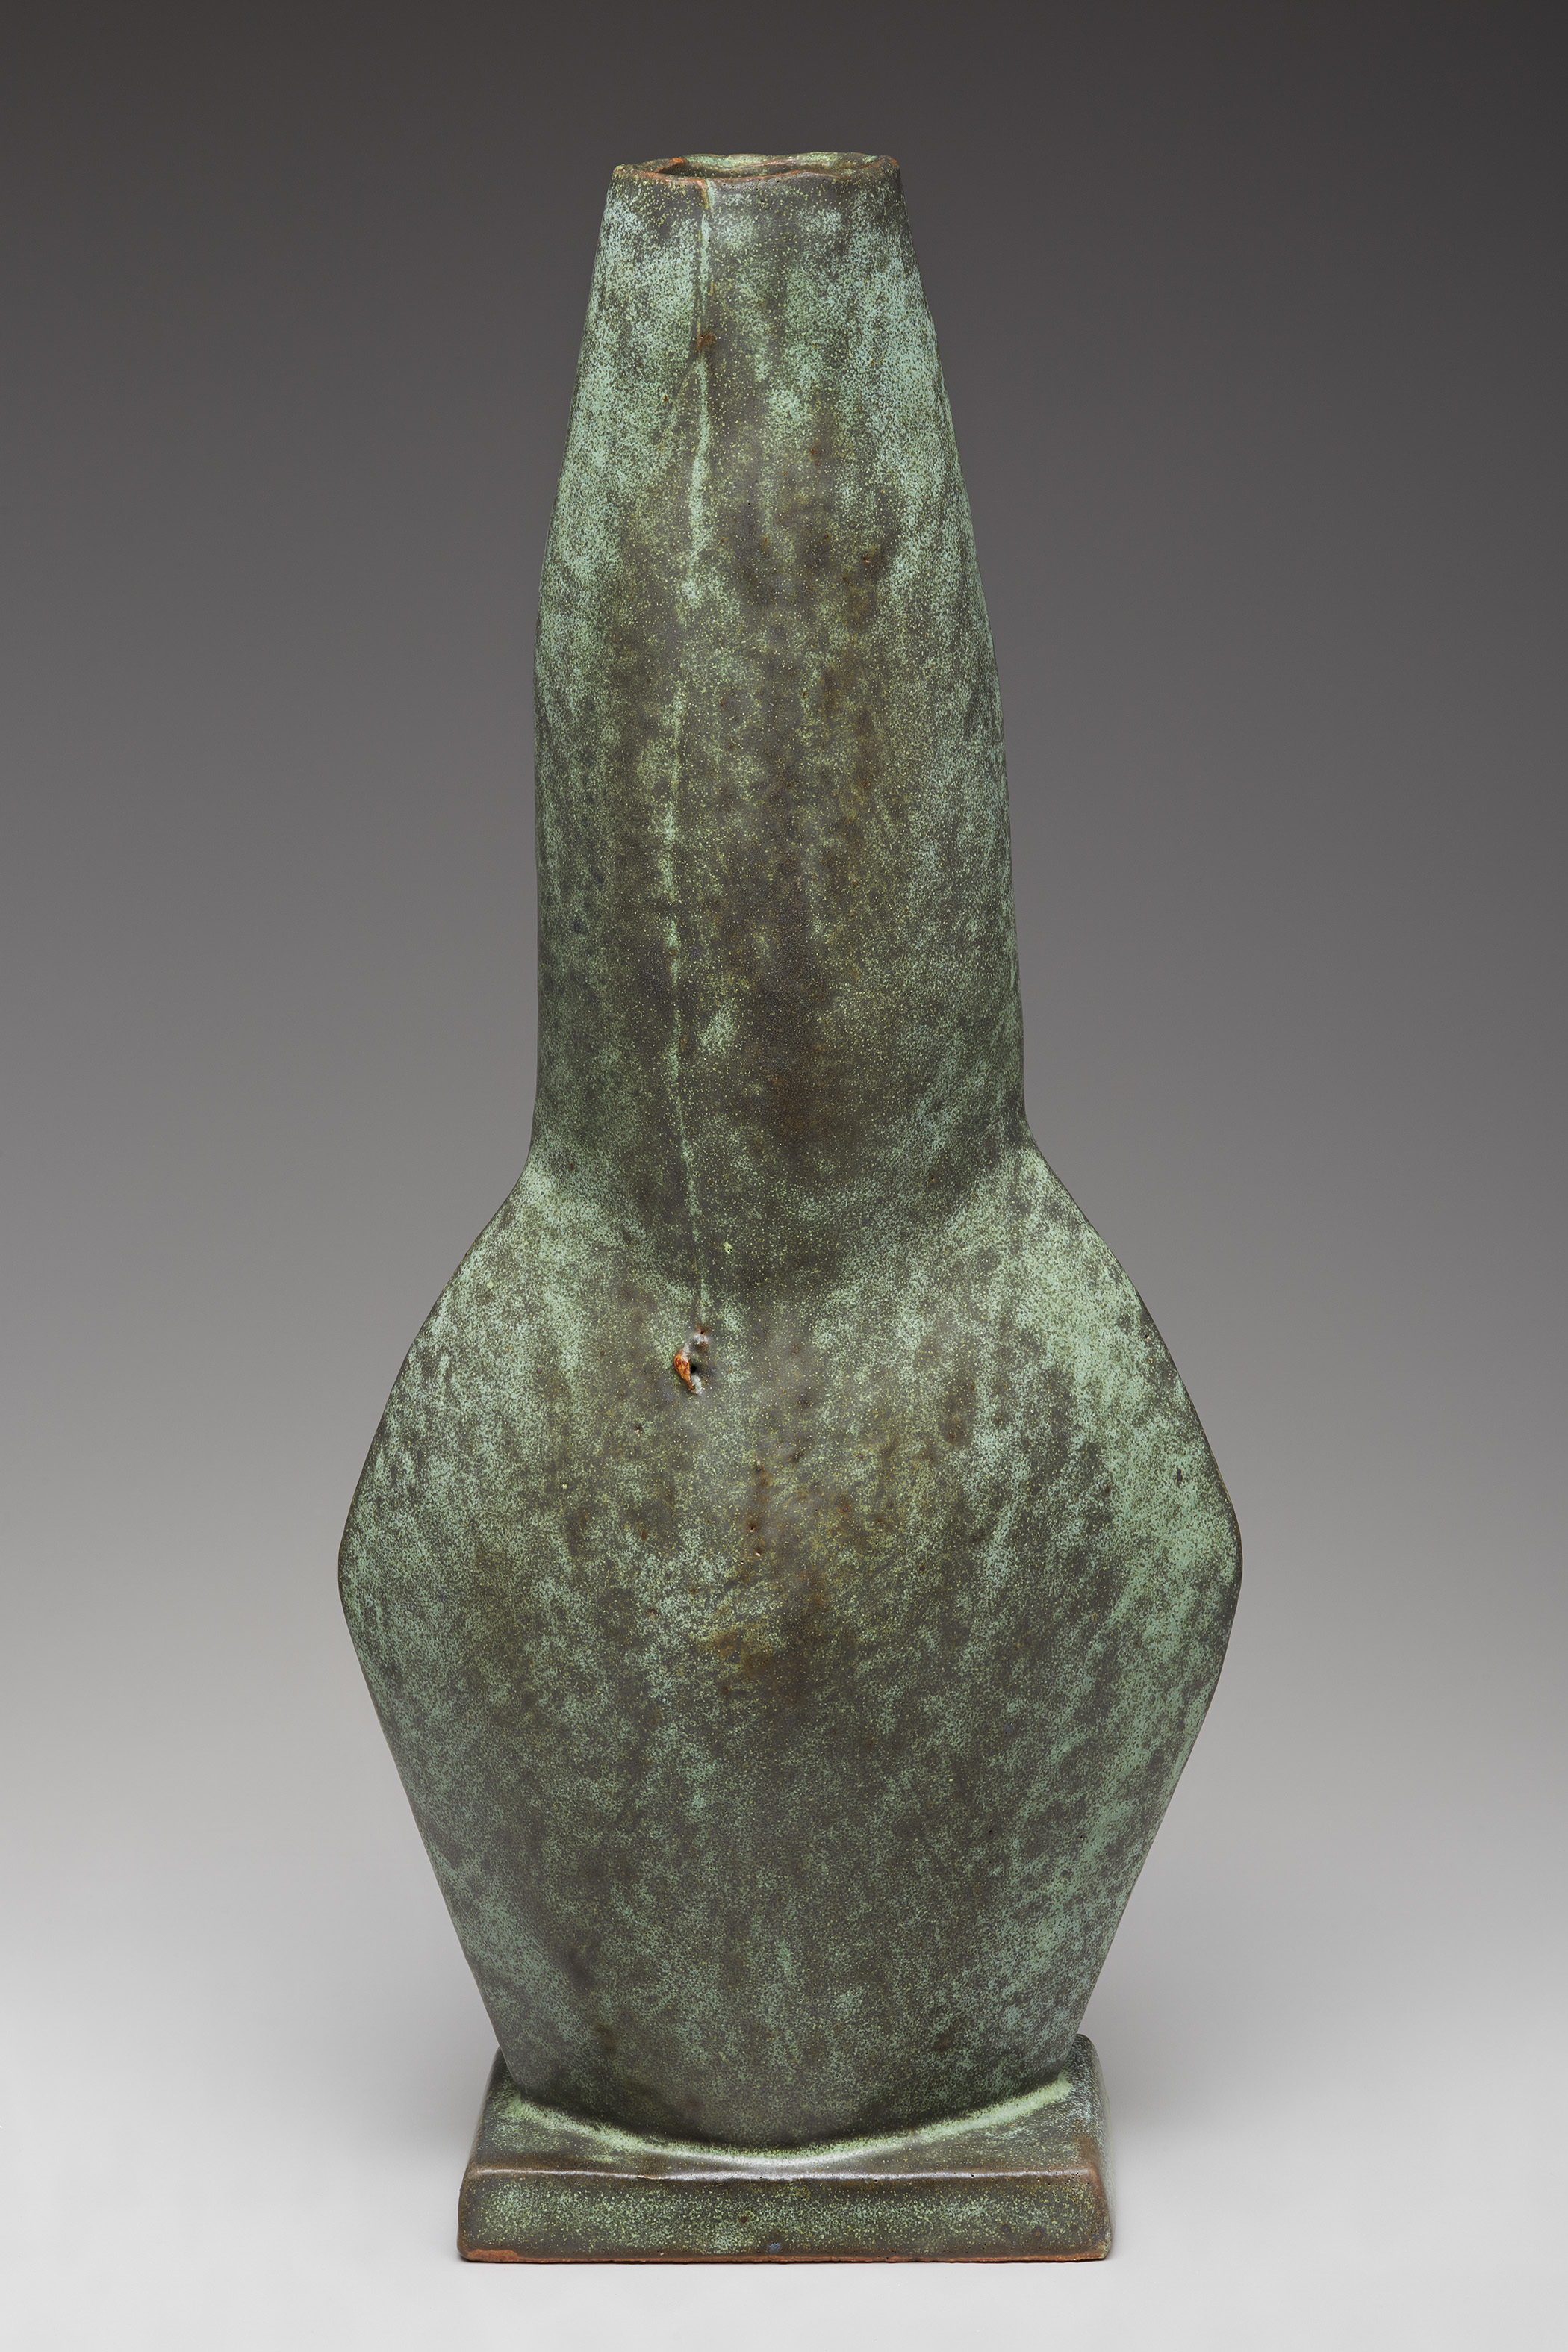 "Randy Johnston  Figurative vase, copper green glaze  Stoneware 19.5 x 8.5 x 6"" RJ608"